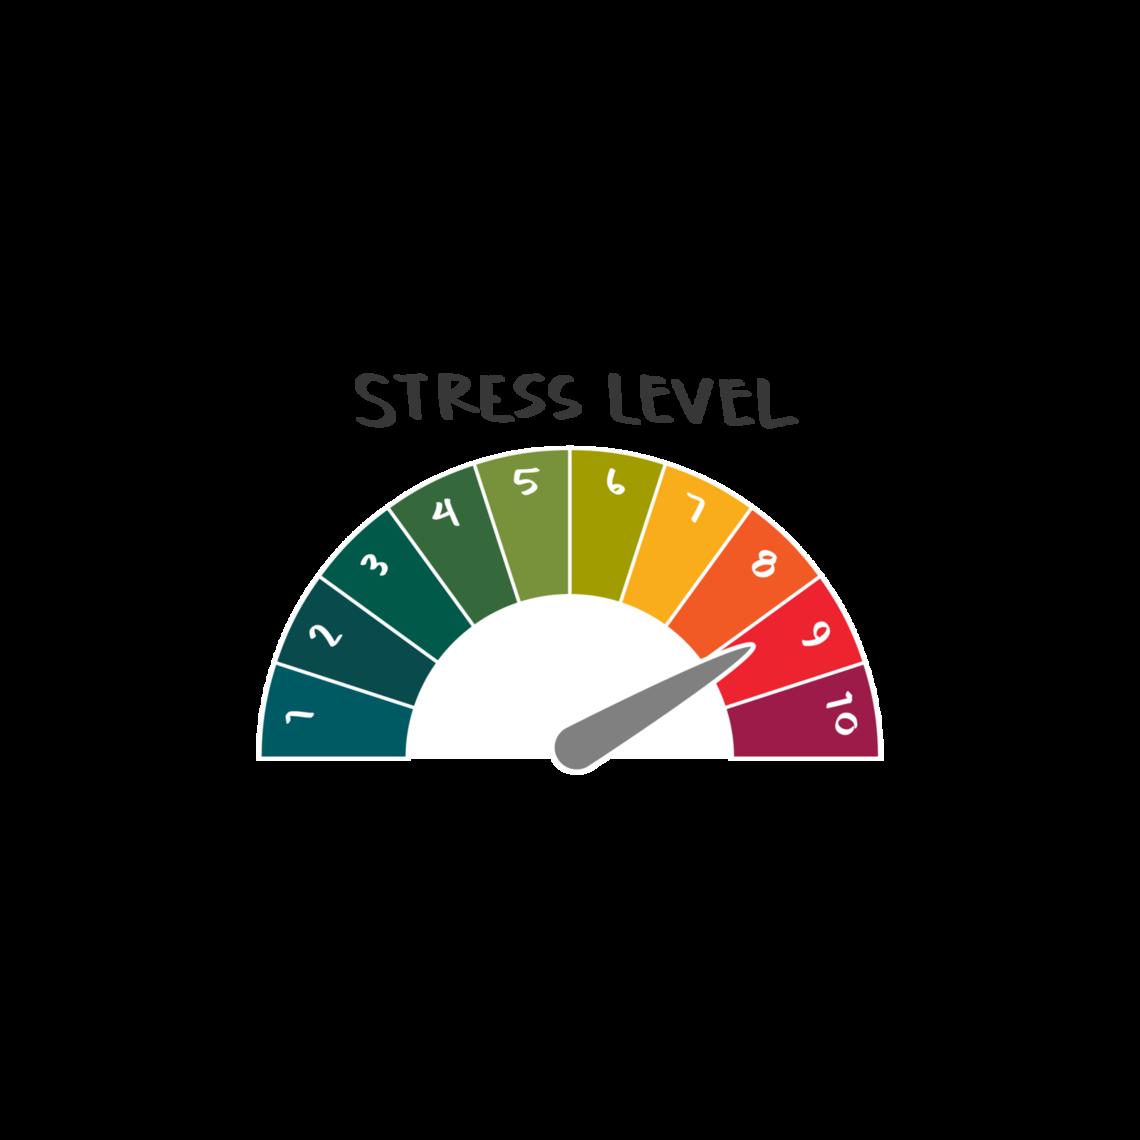 mindshield exercise 3 stress scale